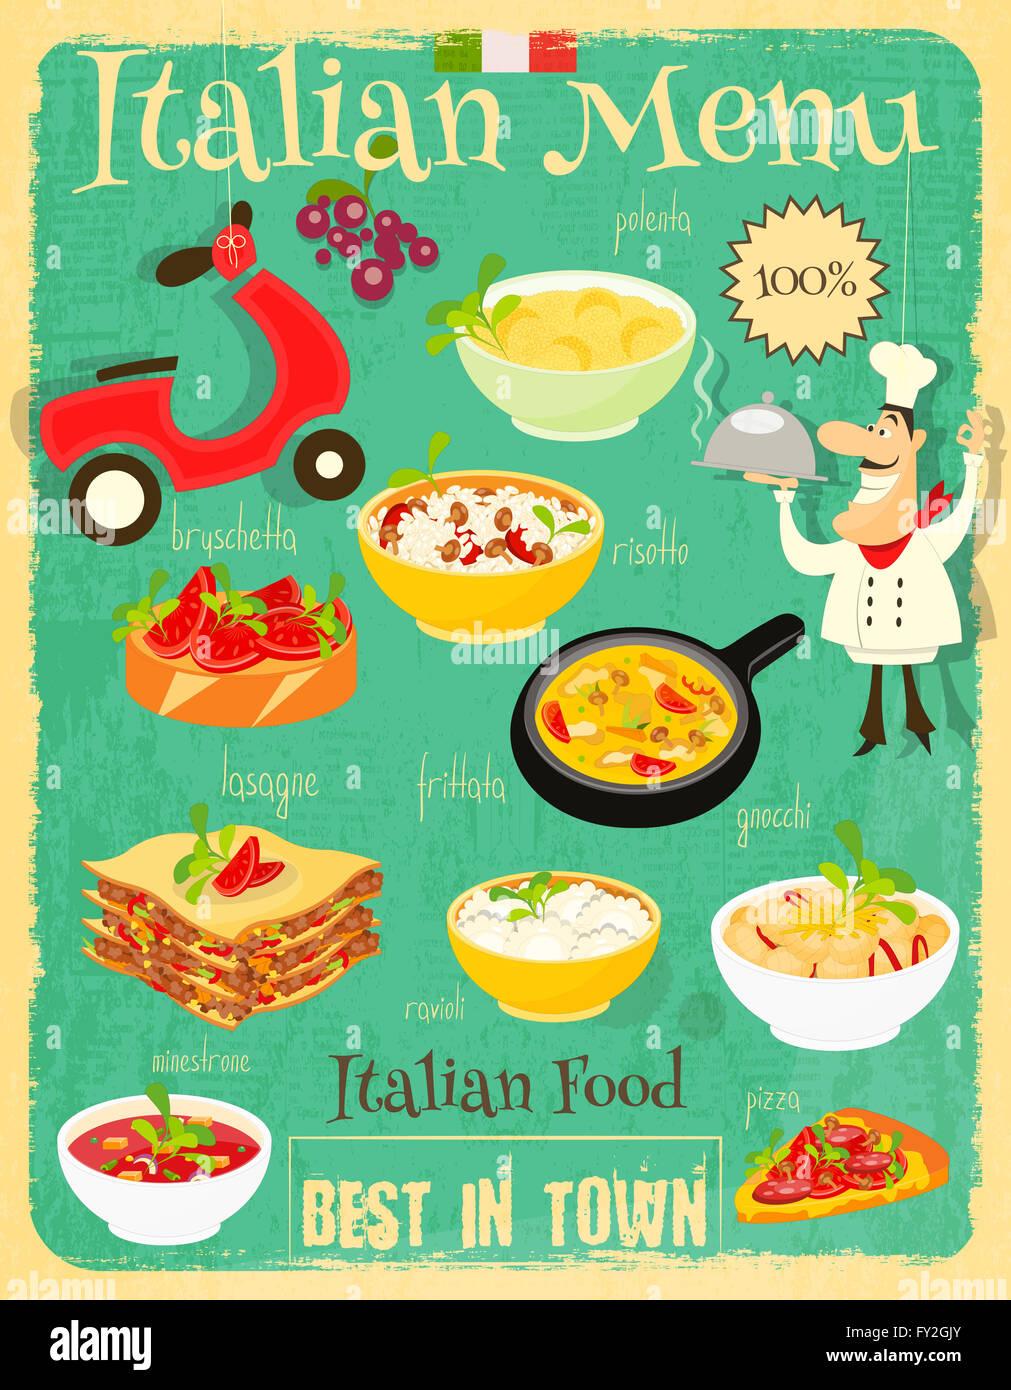 Set Menu Salad Pasta Illustration Stockfotos & Set Menu Salad Pasta ...